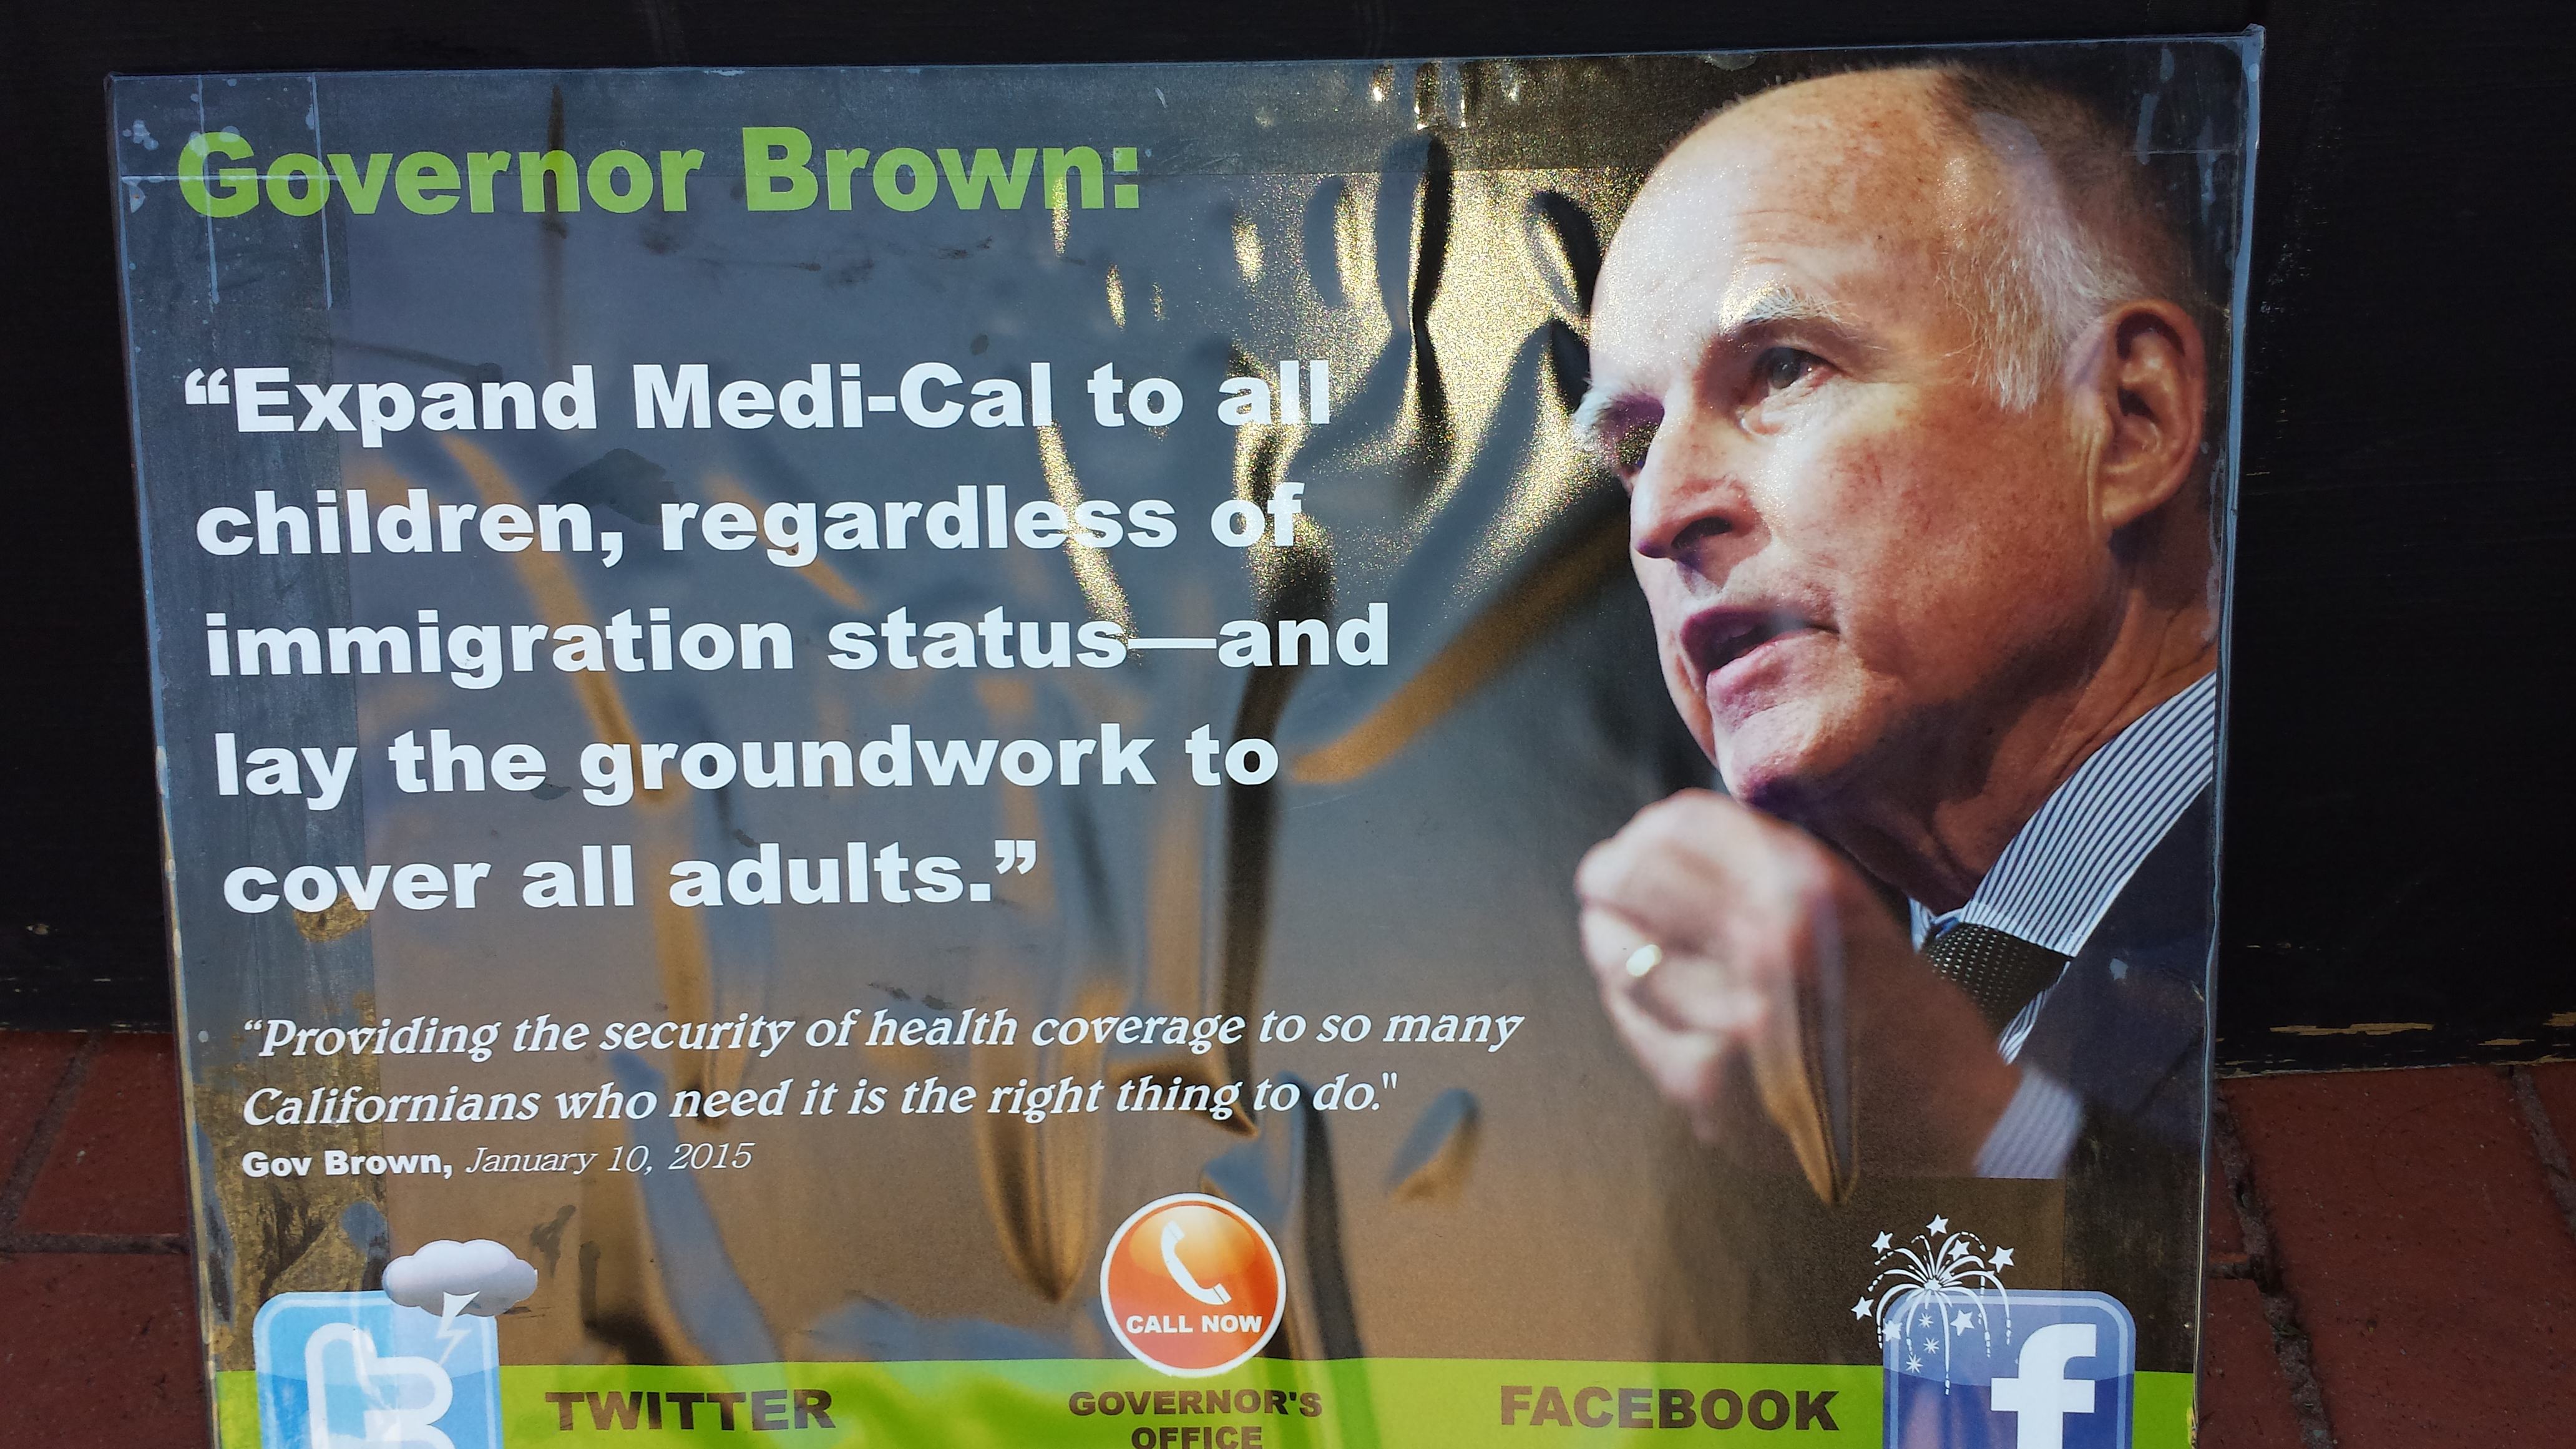 Pancarta de la campana para presionar al gobernador de California Jerry Brown.